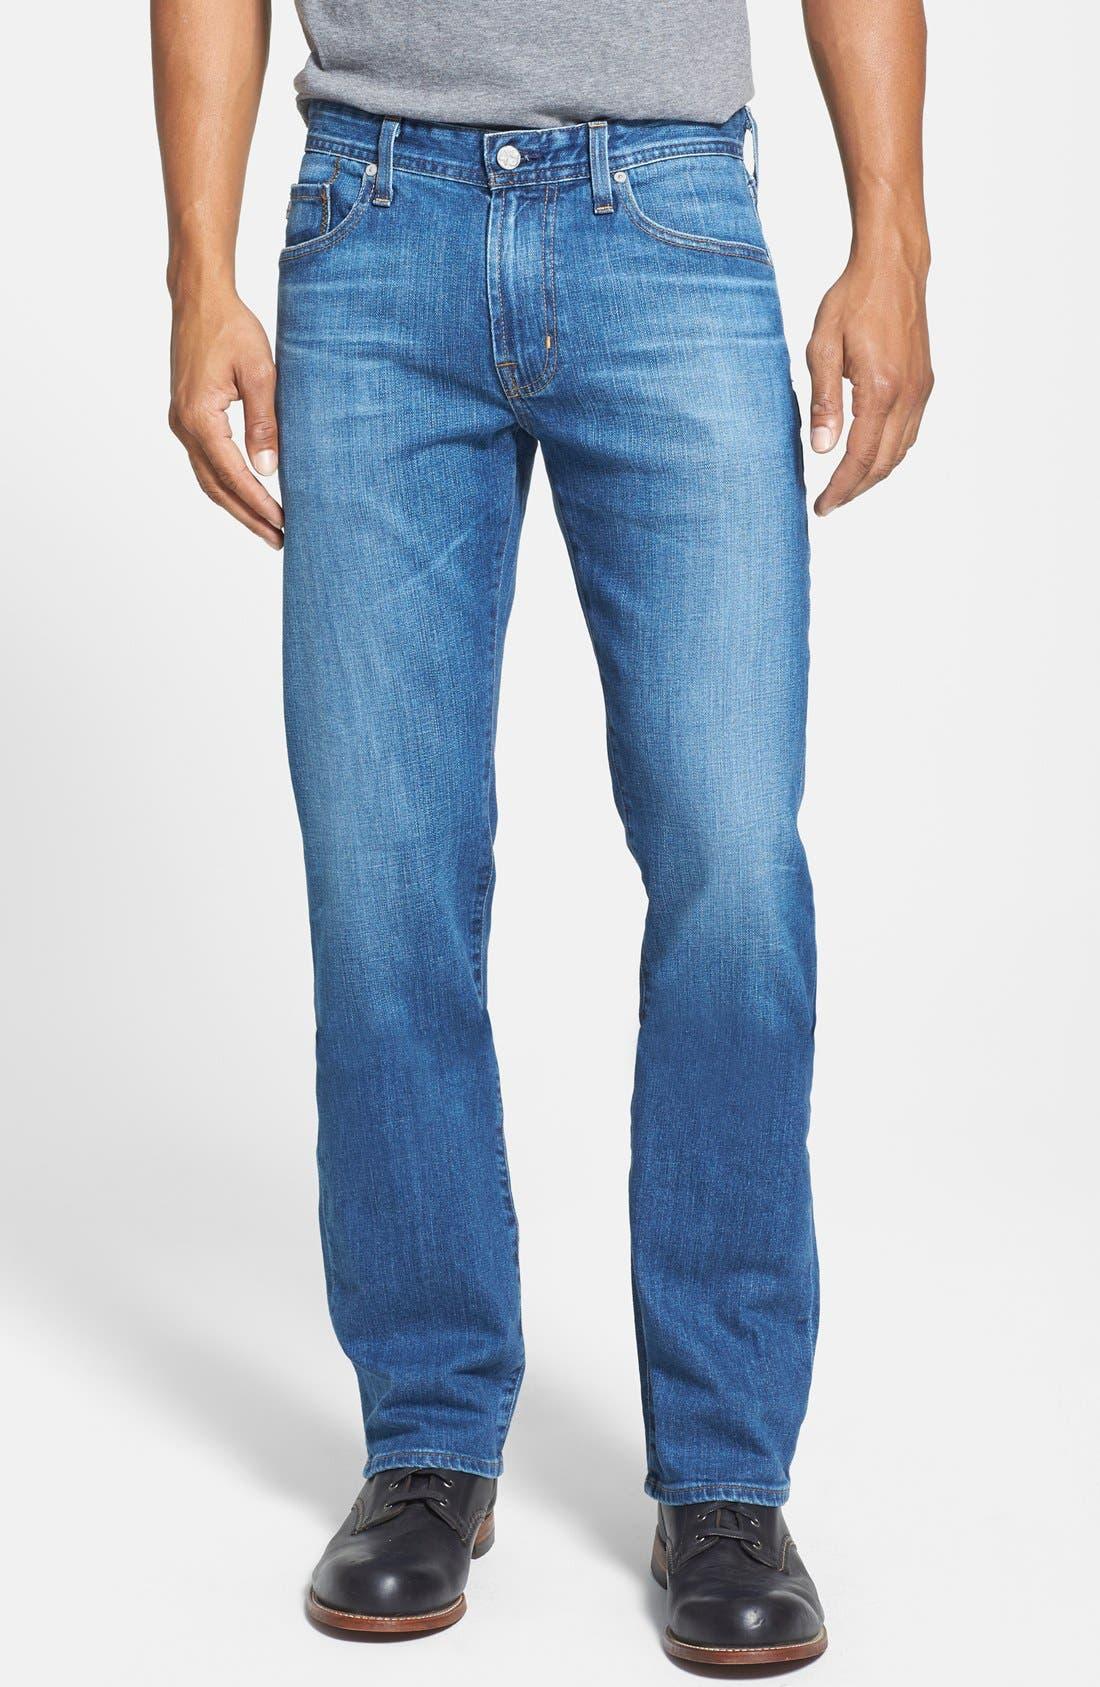 Main Image - AG Jeans 'Protégé' Straight Leg Jeans (Eleven Year Wildcraft)